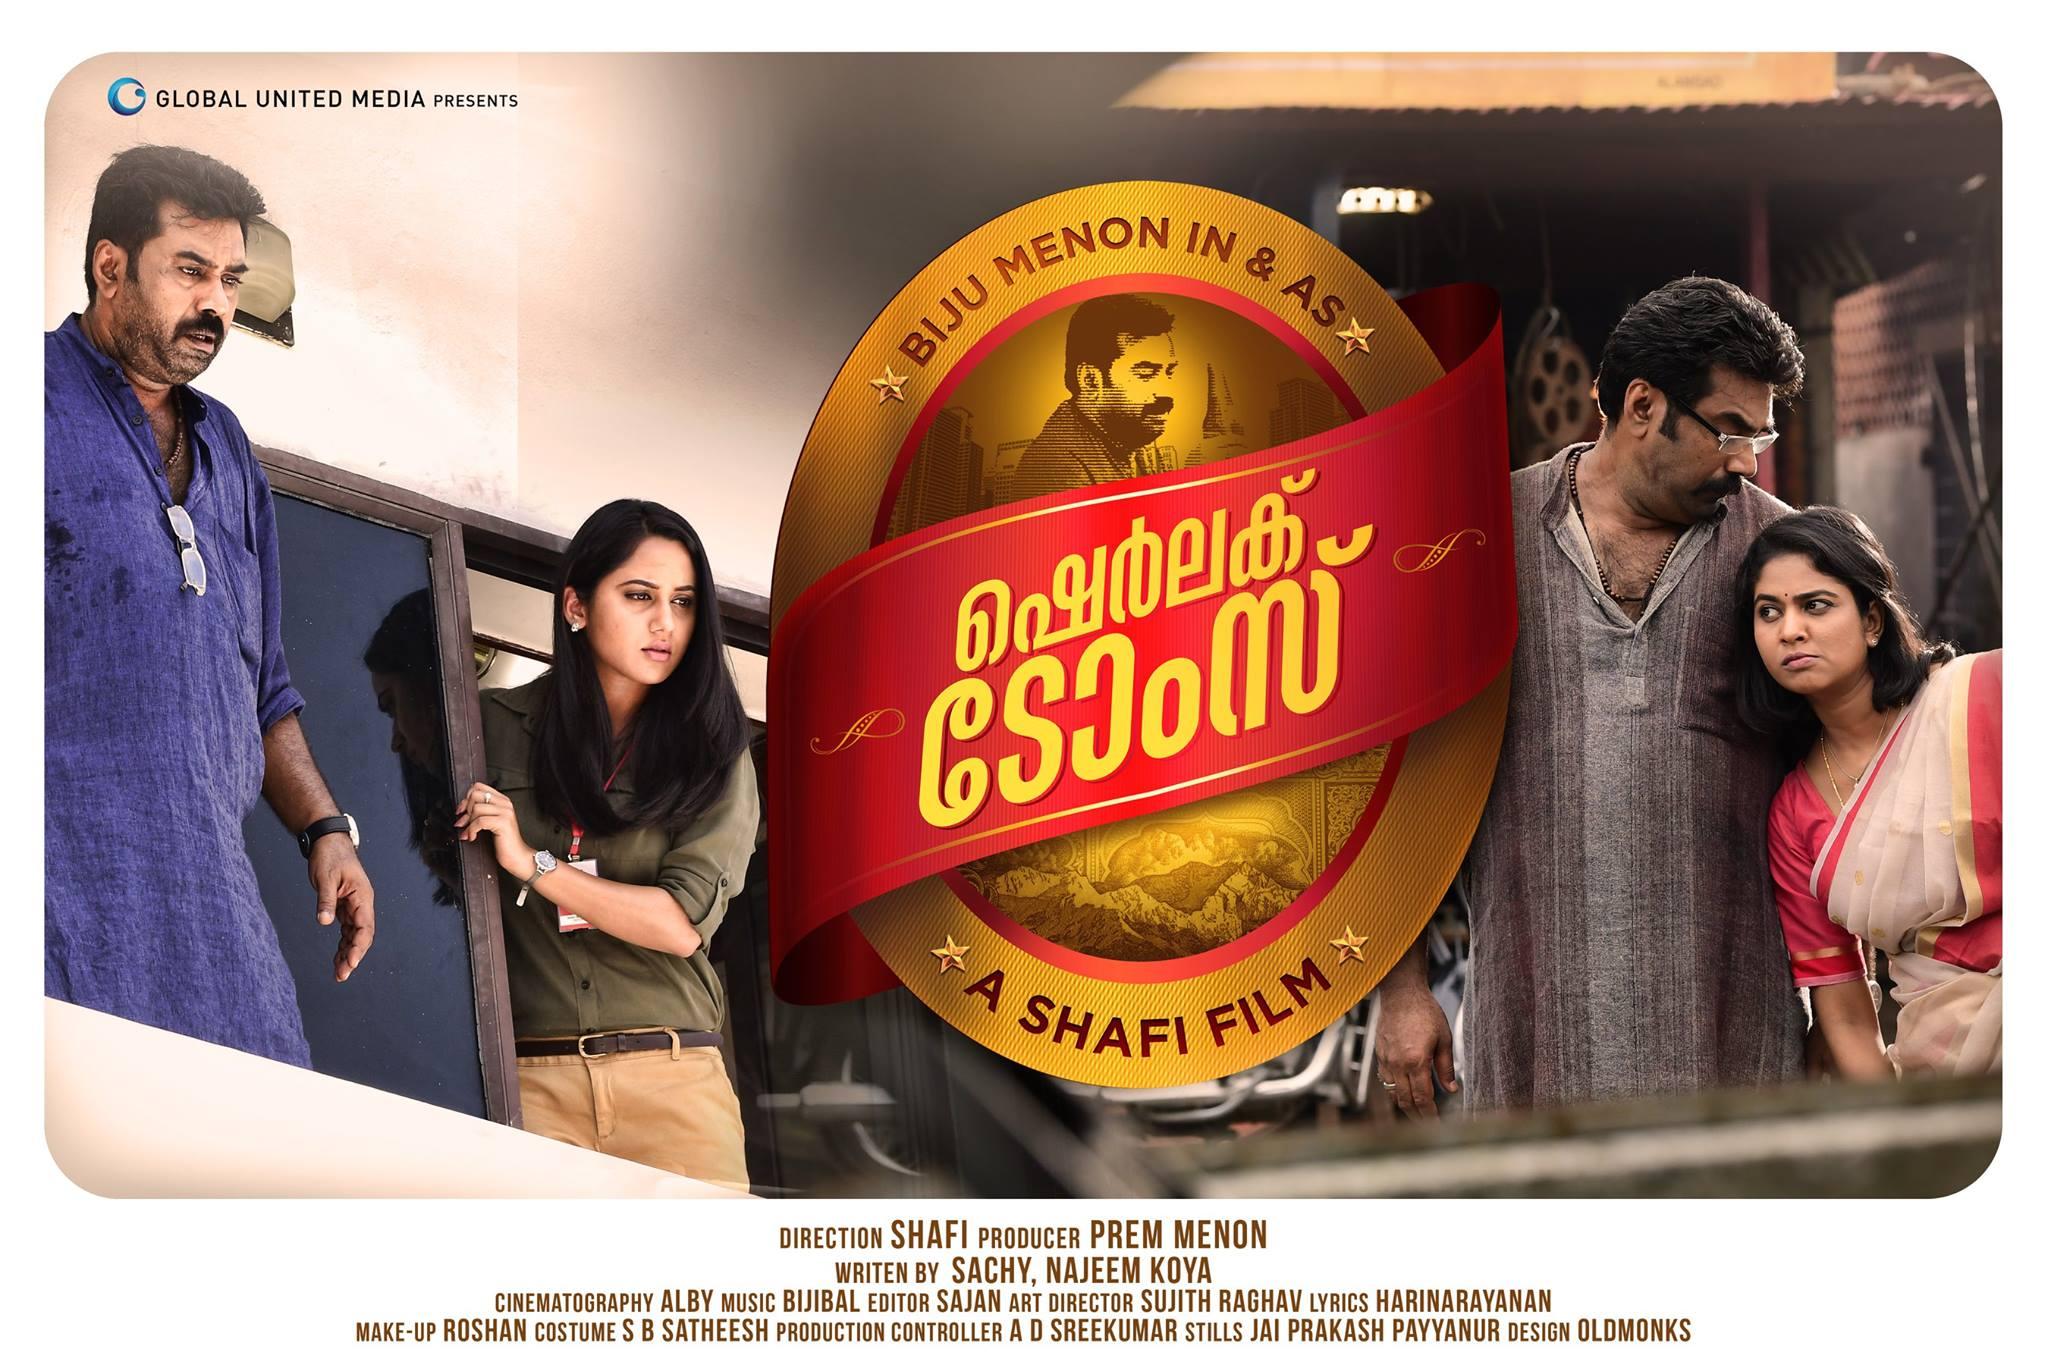 Sherlock-Toms-Malayalam-Movie-Review-Veeyen-3.jpg